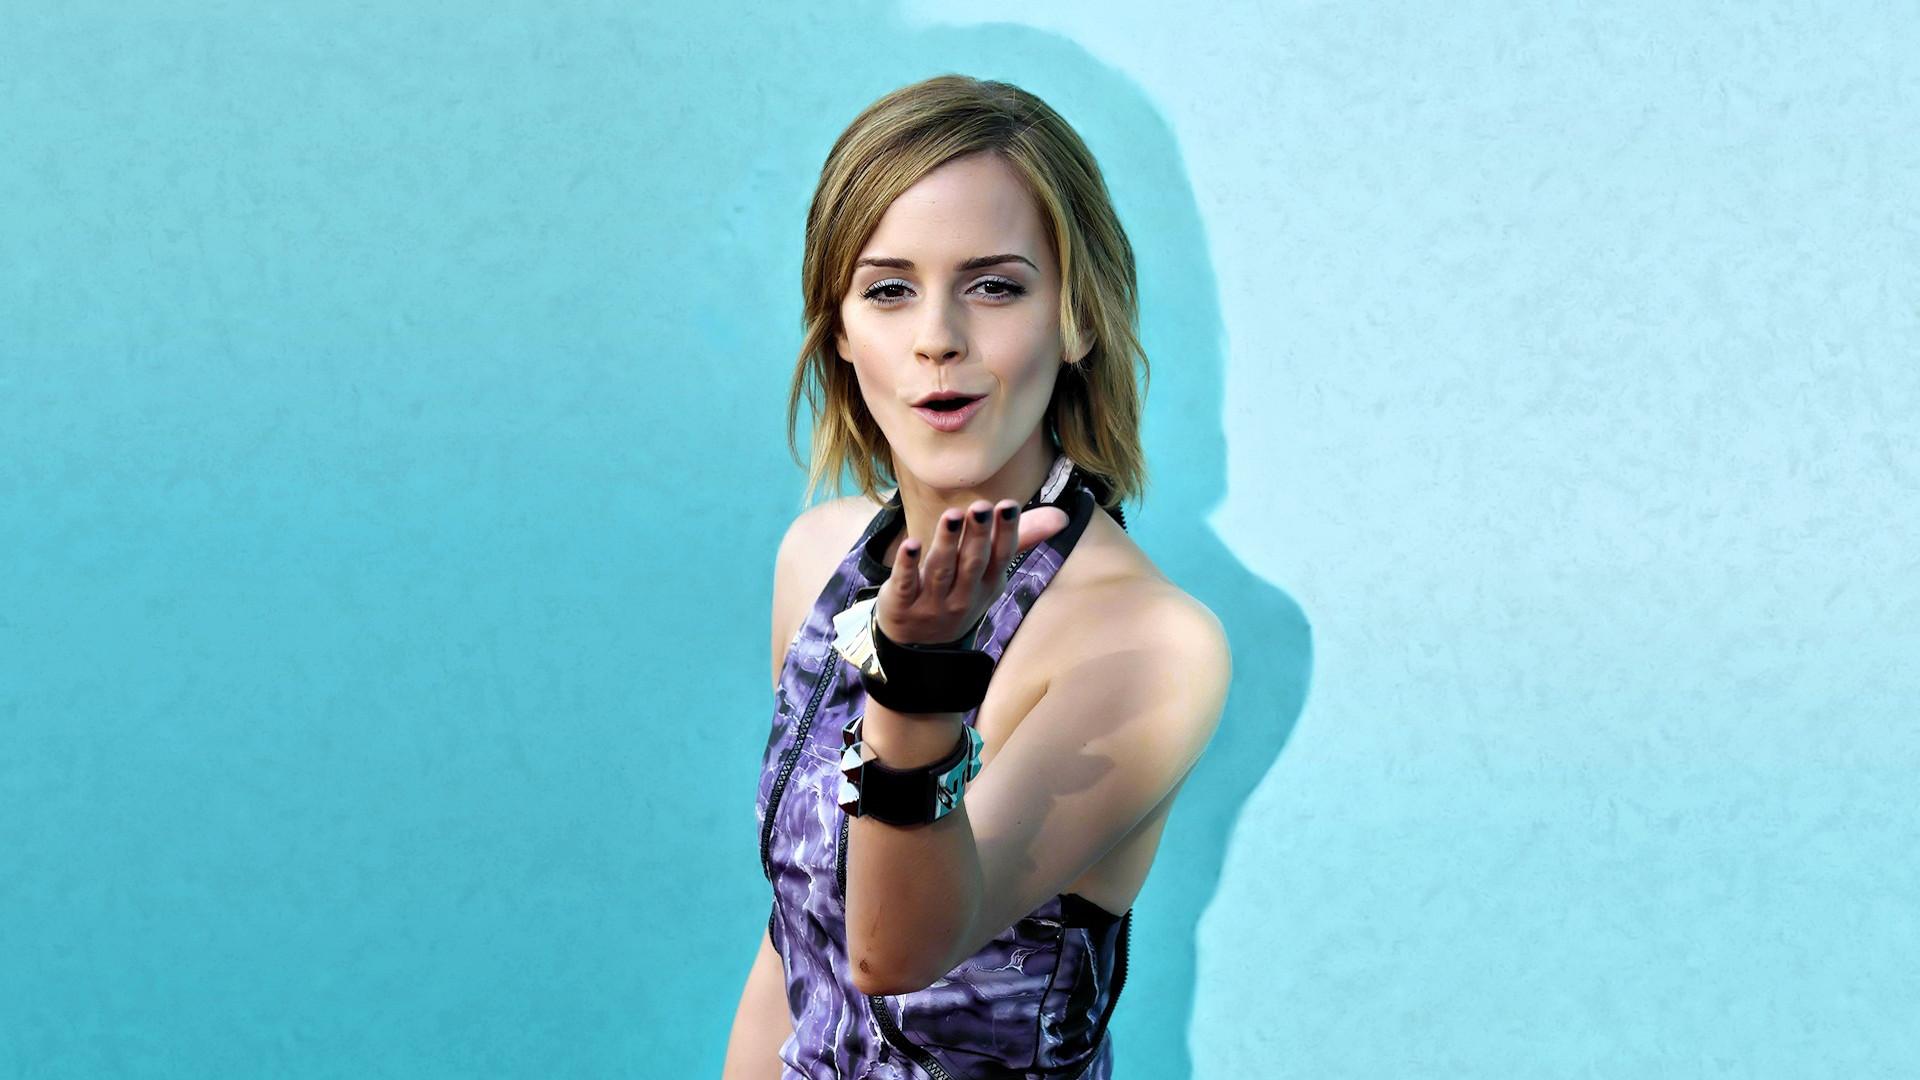 Emma Watson flying kiss Wallpapers